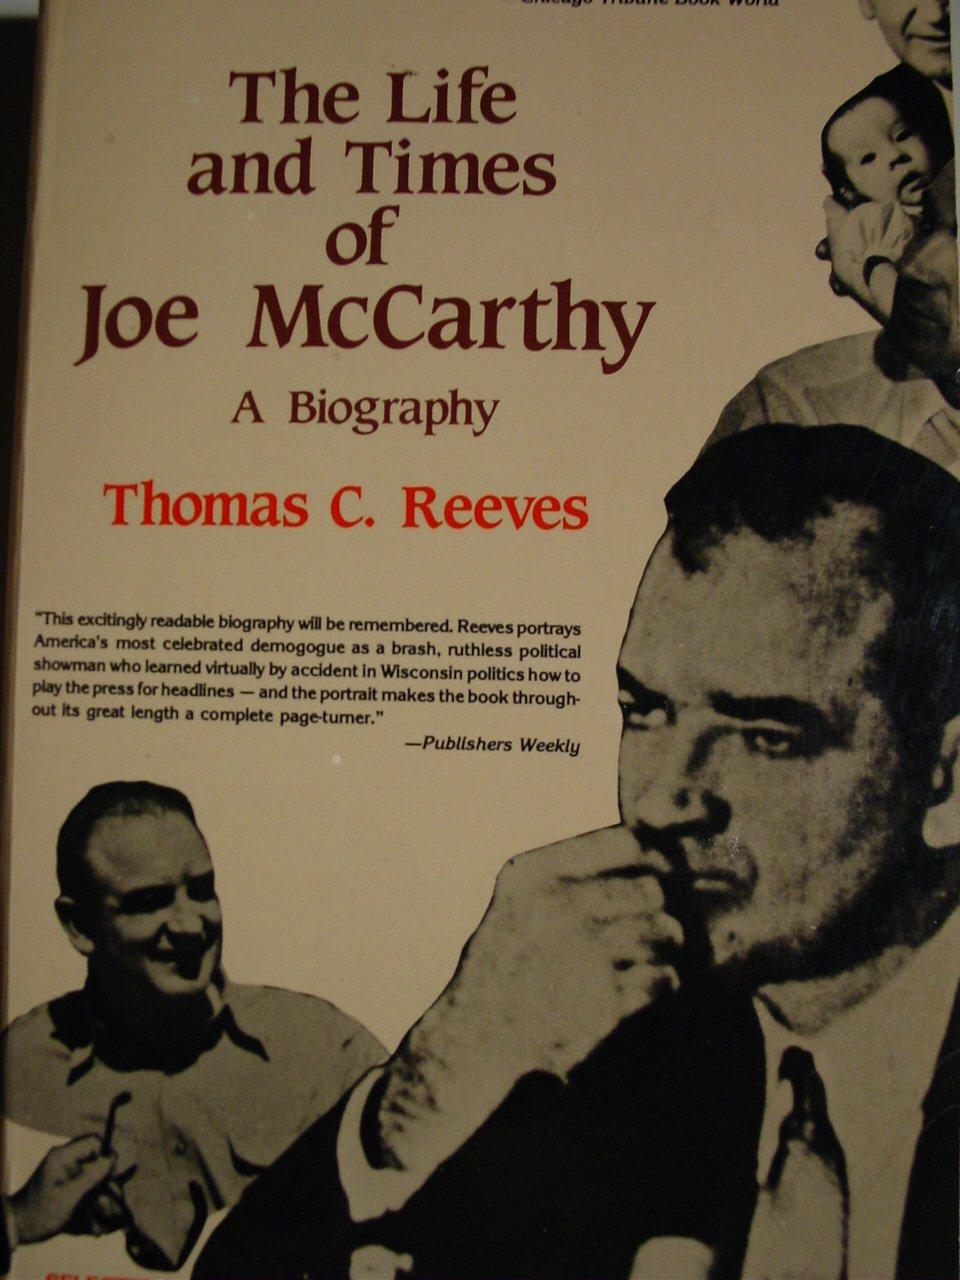 The Life and Times of Joe McCarthy: A Biography: Thomas liC. Reeves:  9780812823370: Amazon.com: Books